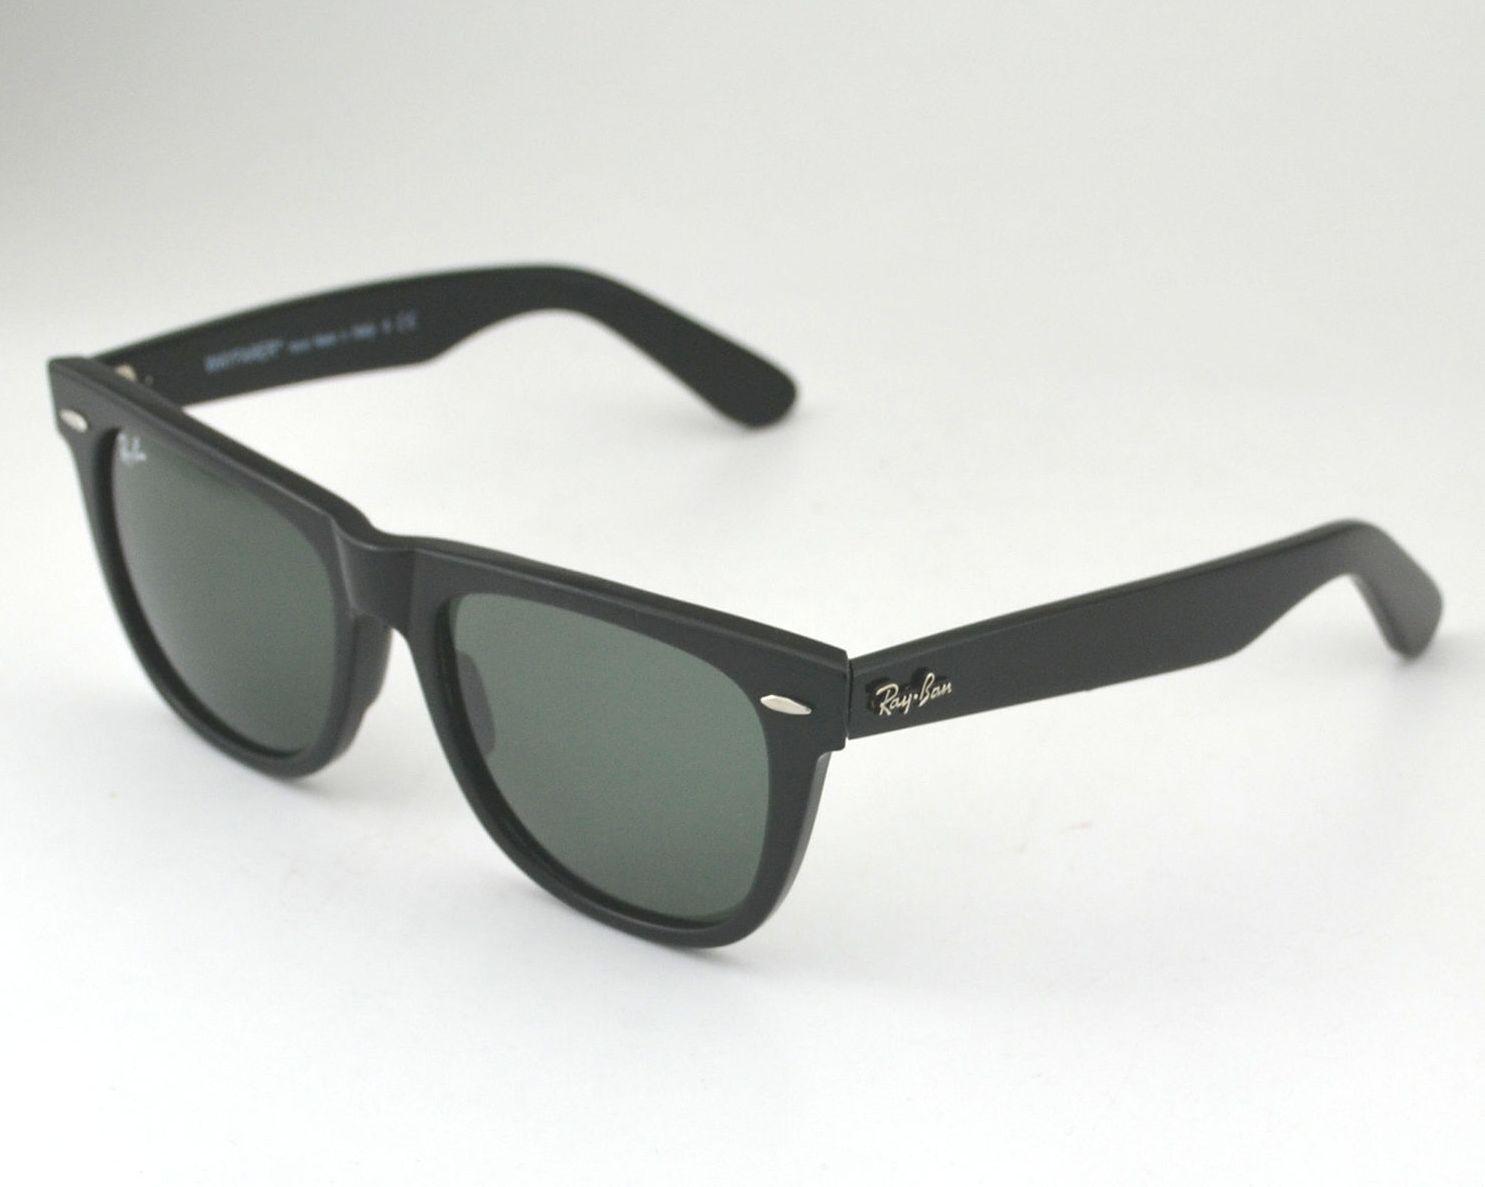 Ray Ban RB 2140 Original Wayfarer 901 Black Frame/ Green Classic G-15 Glass 54mm